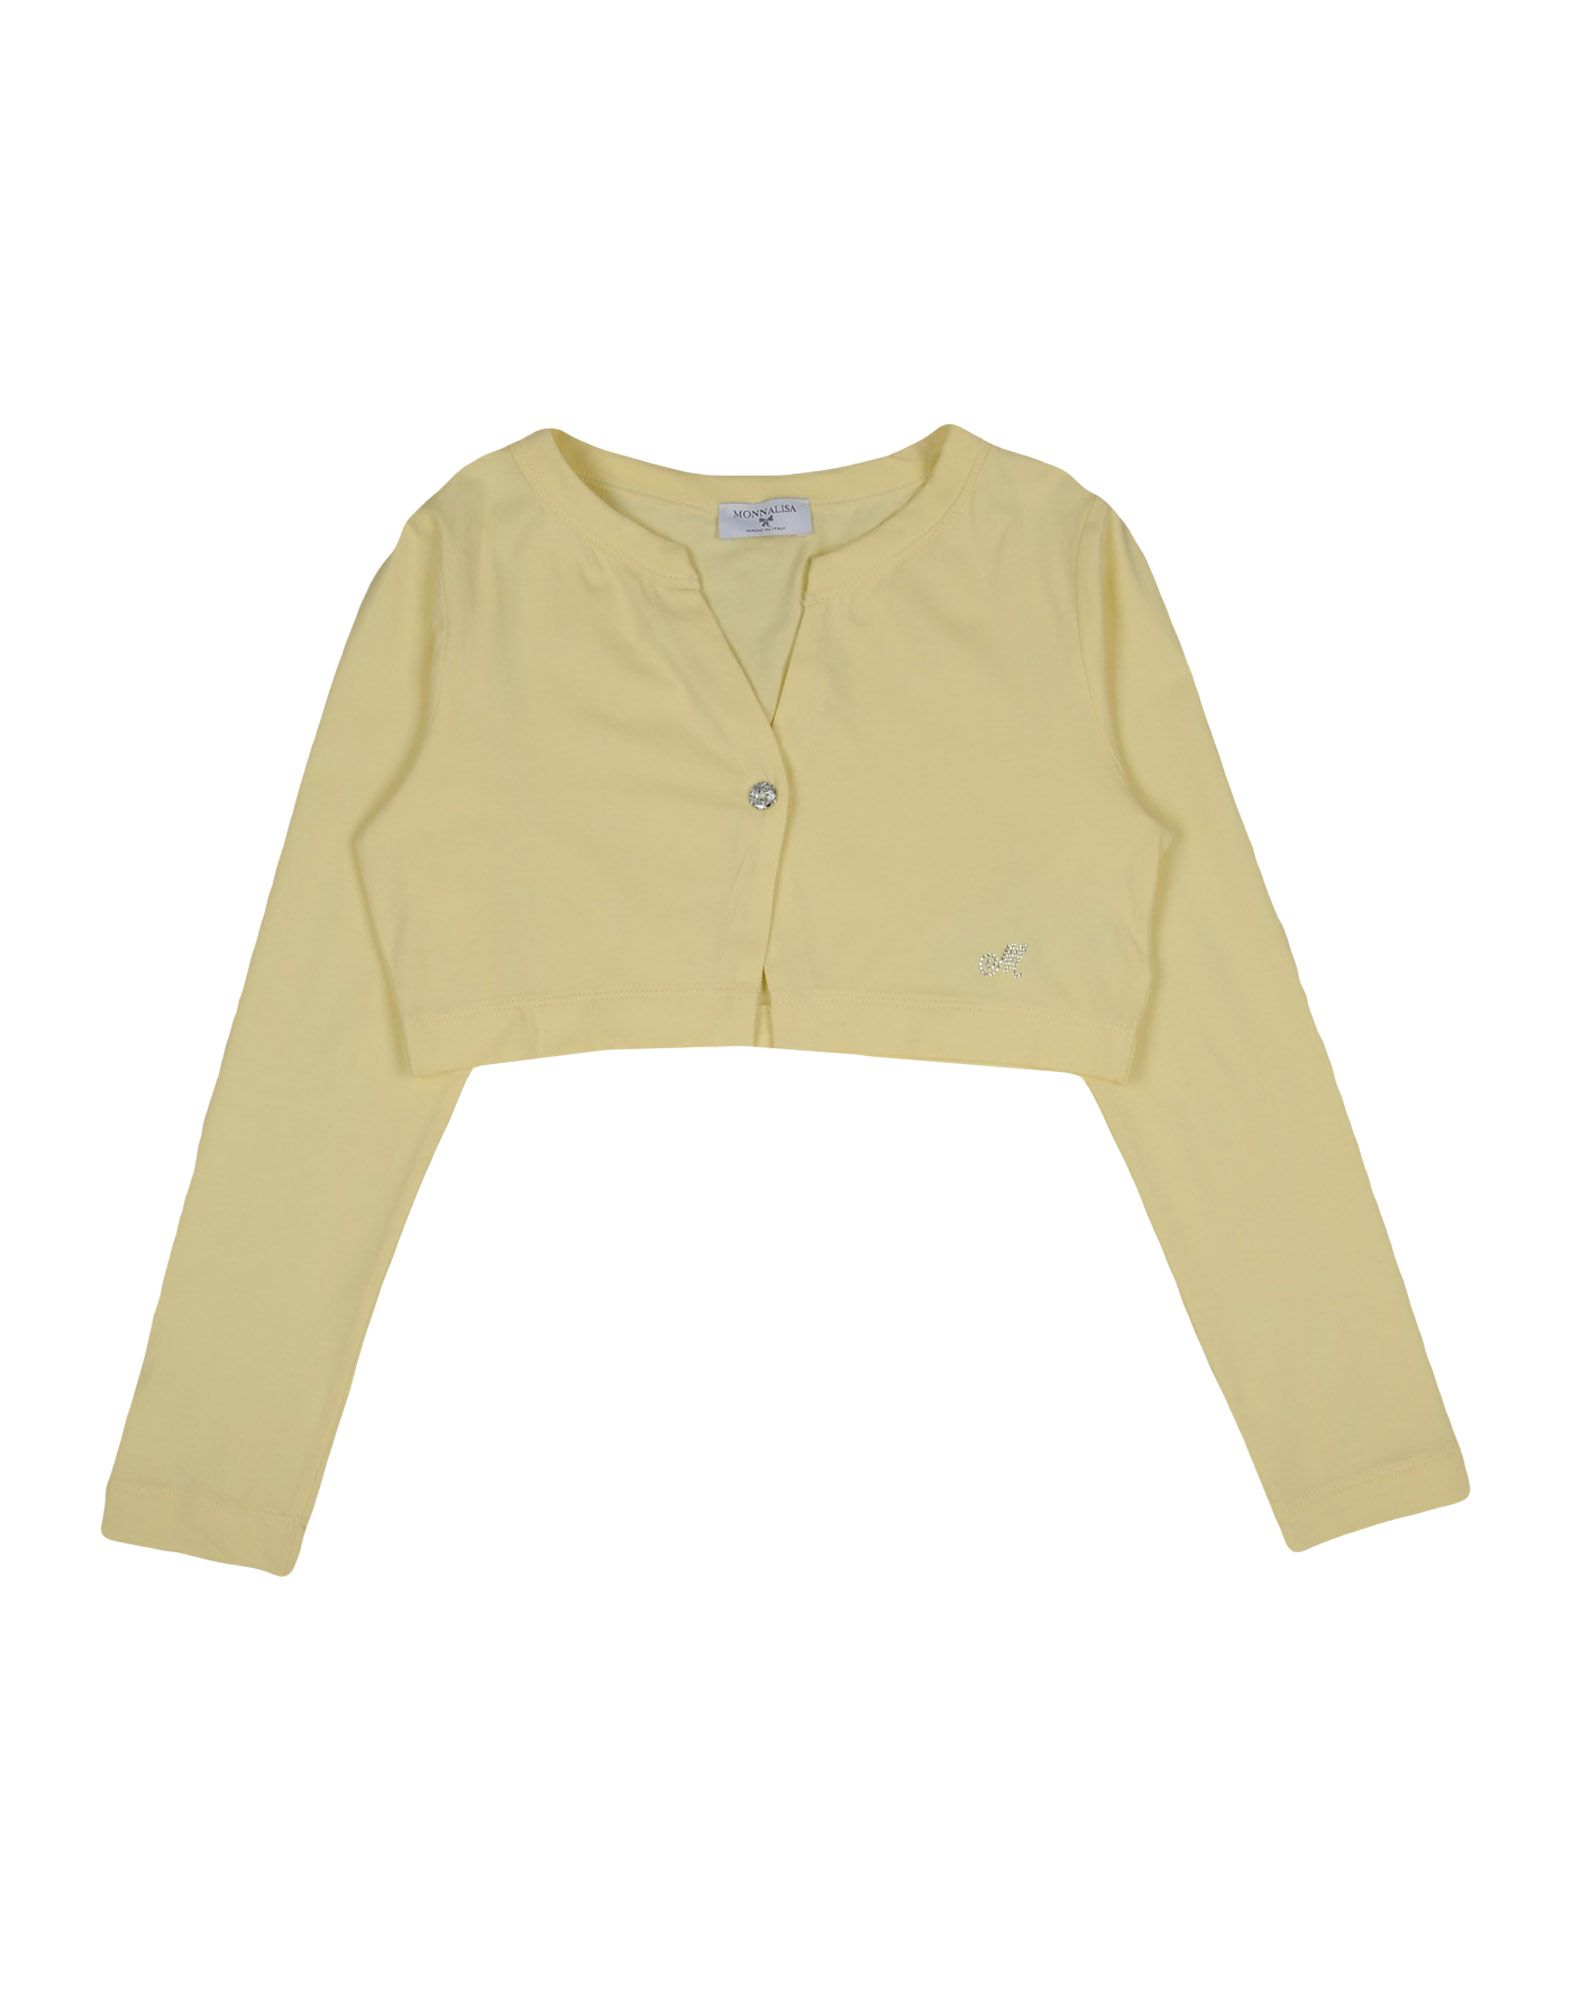 MONNALISA Cardigan in Yellow